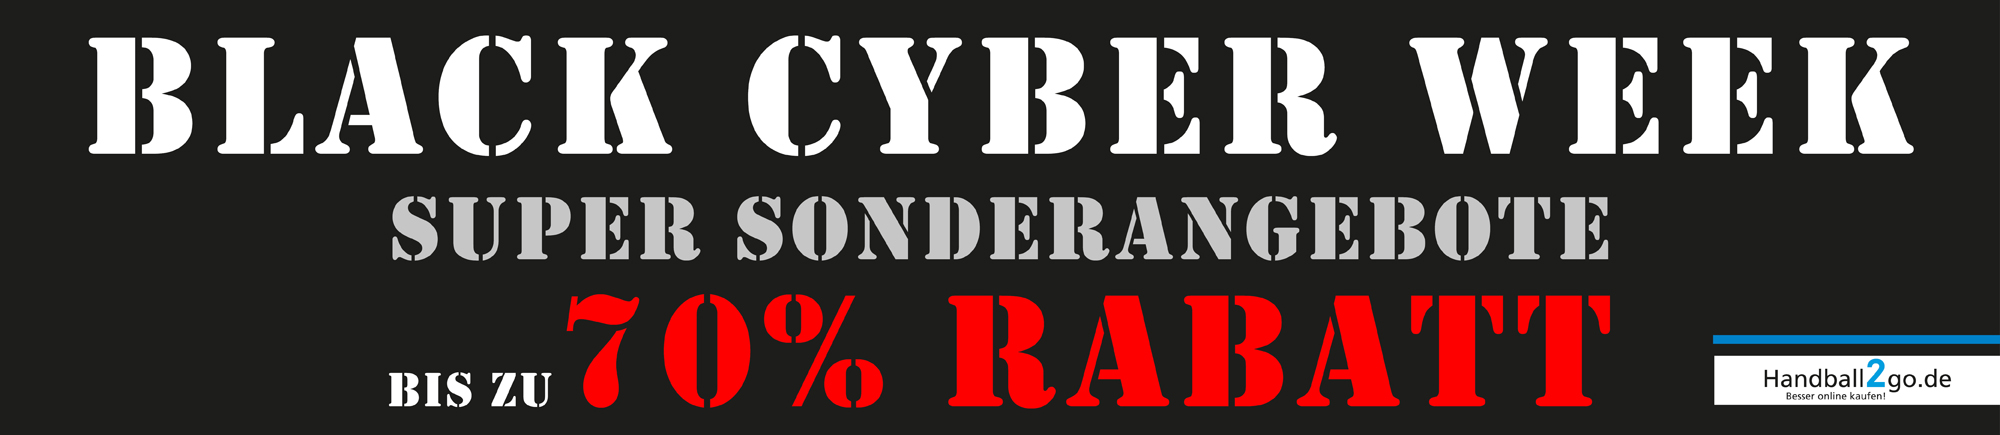 Black Cyber Week